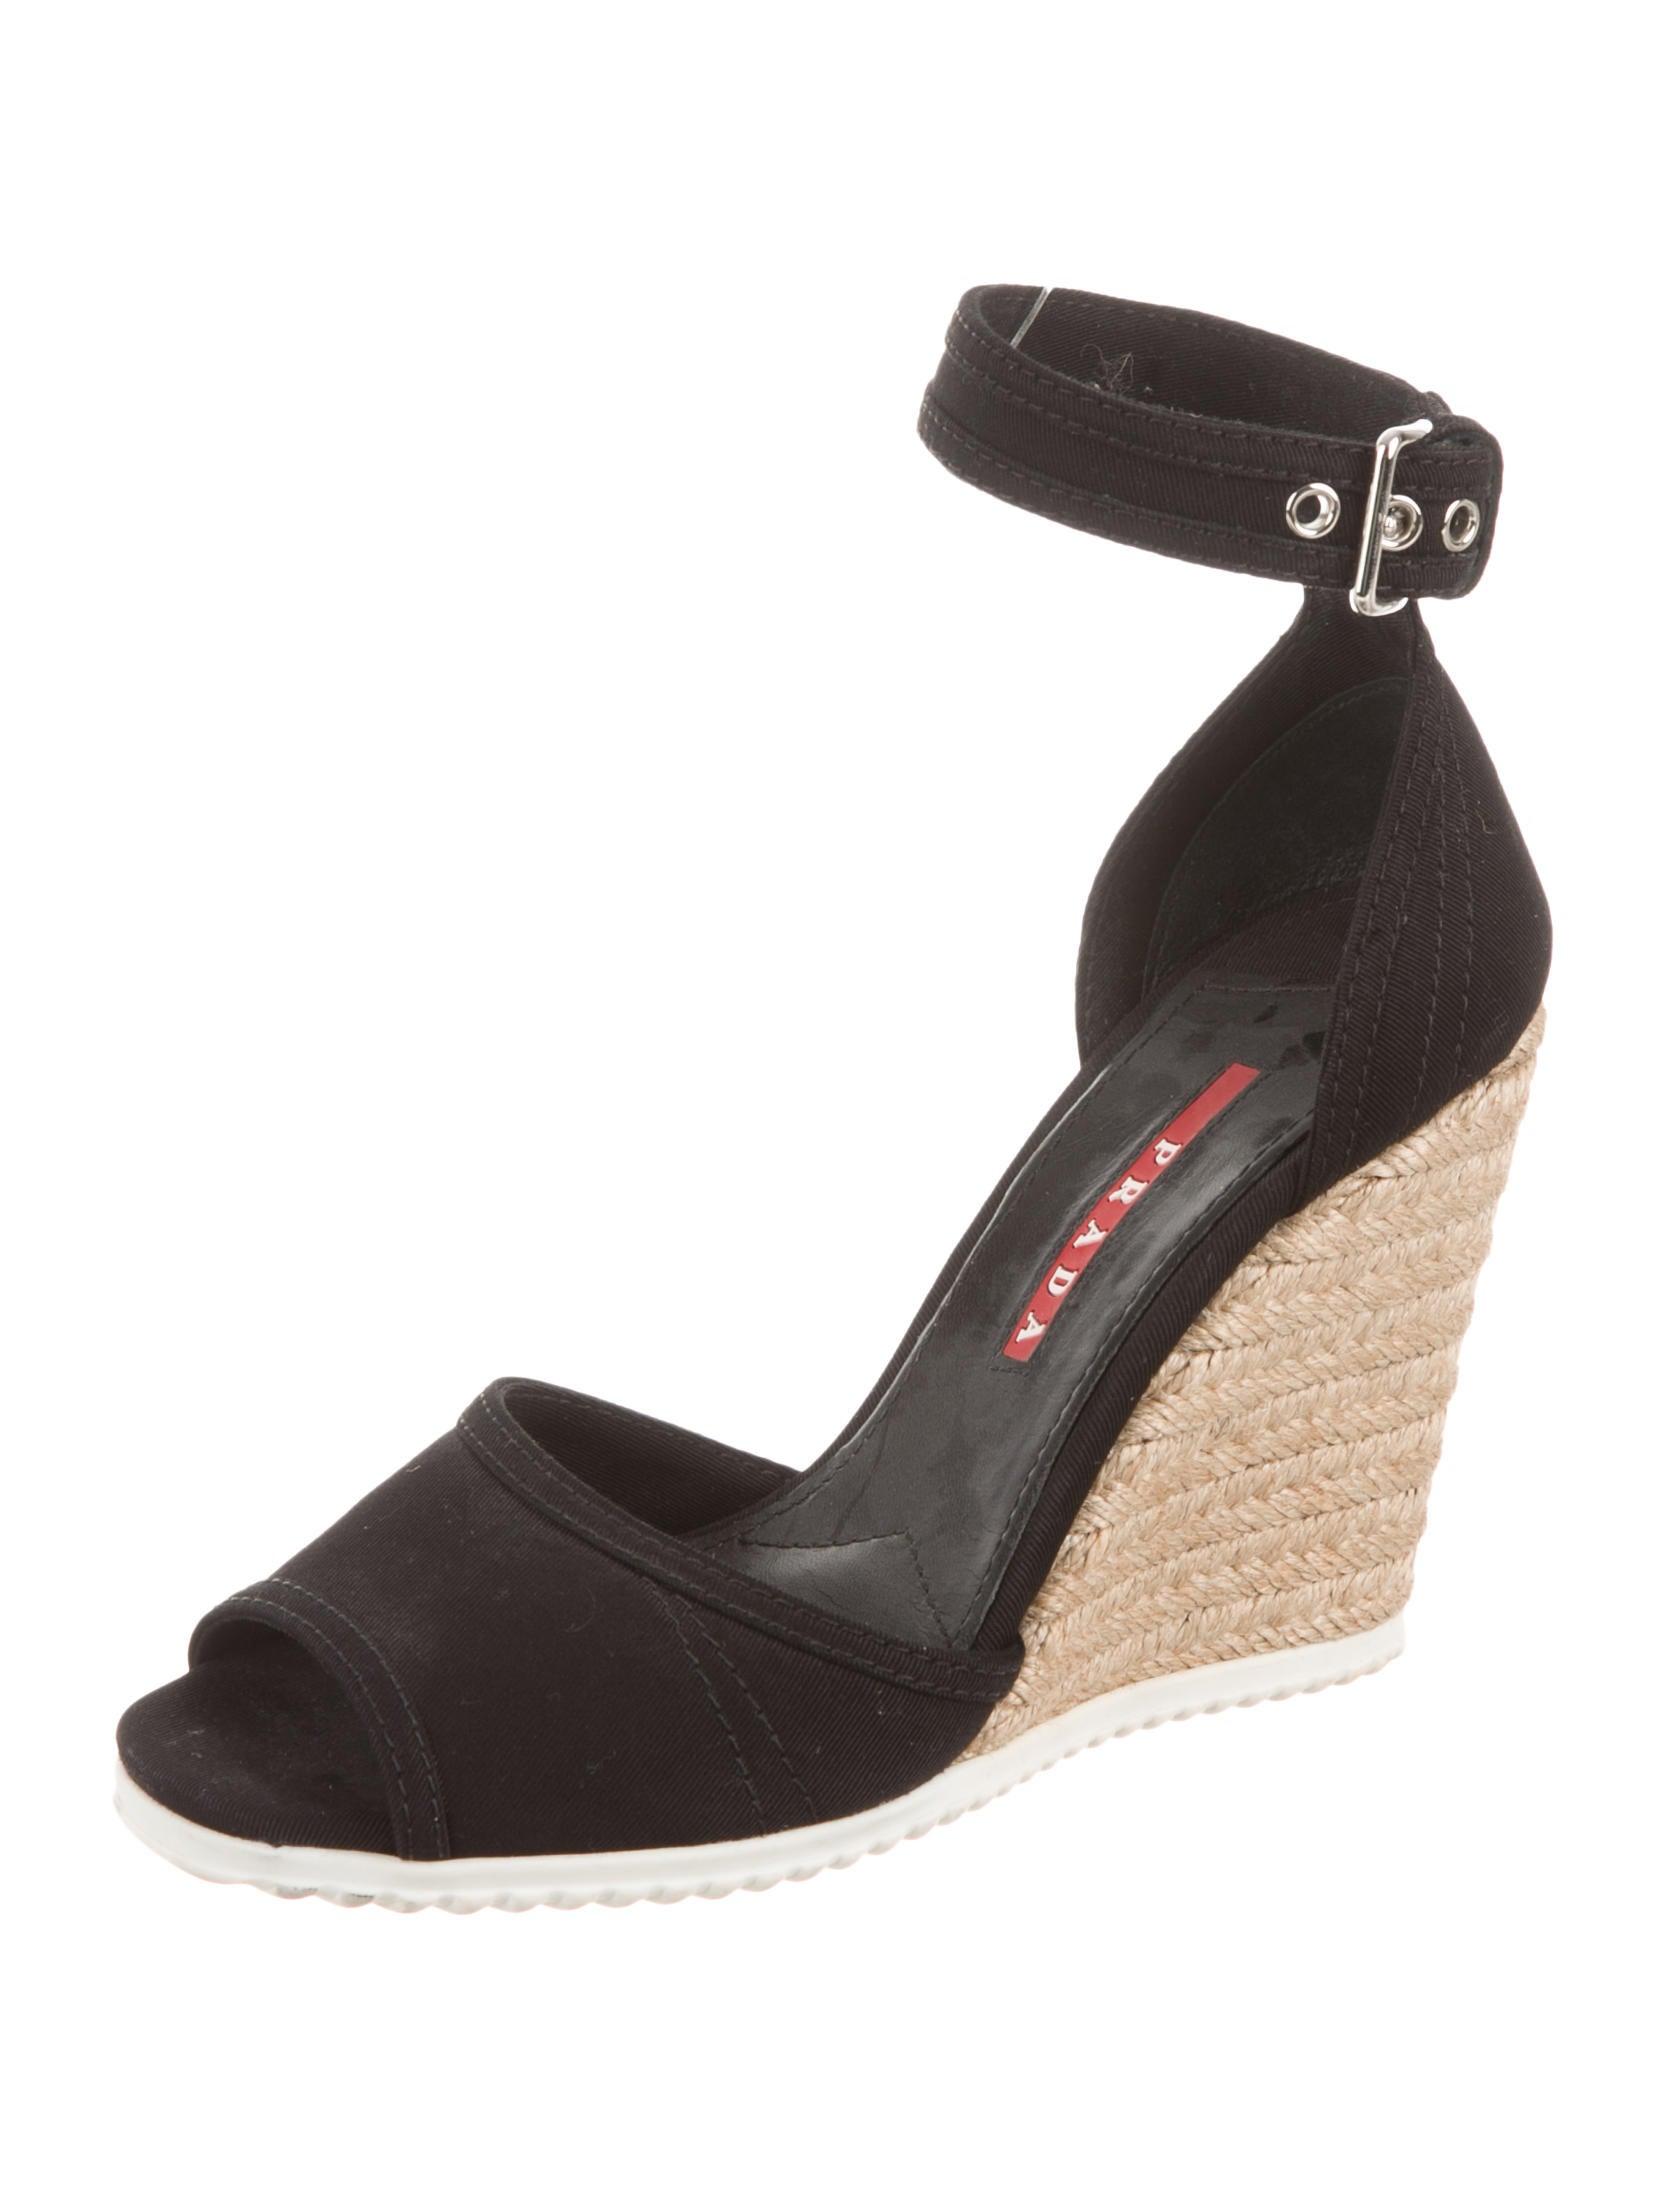 prada sport canvas wedge sandals shoes wpr29837 the